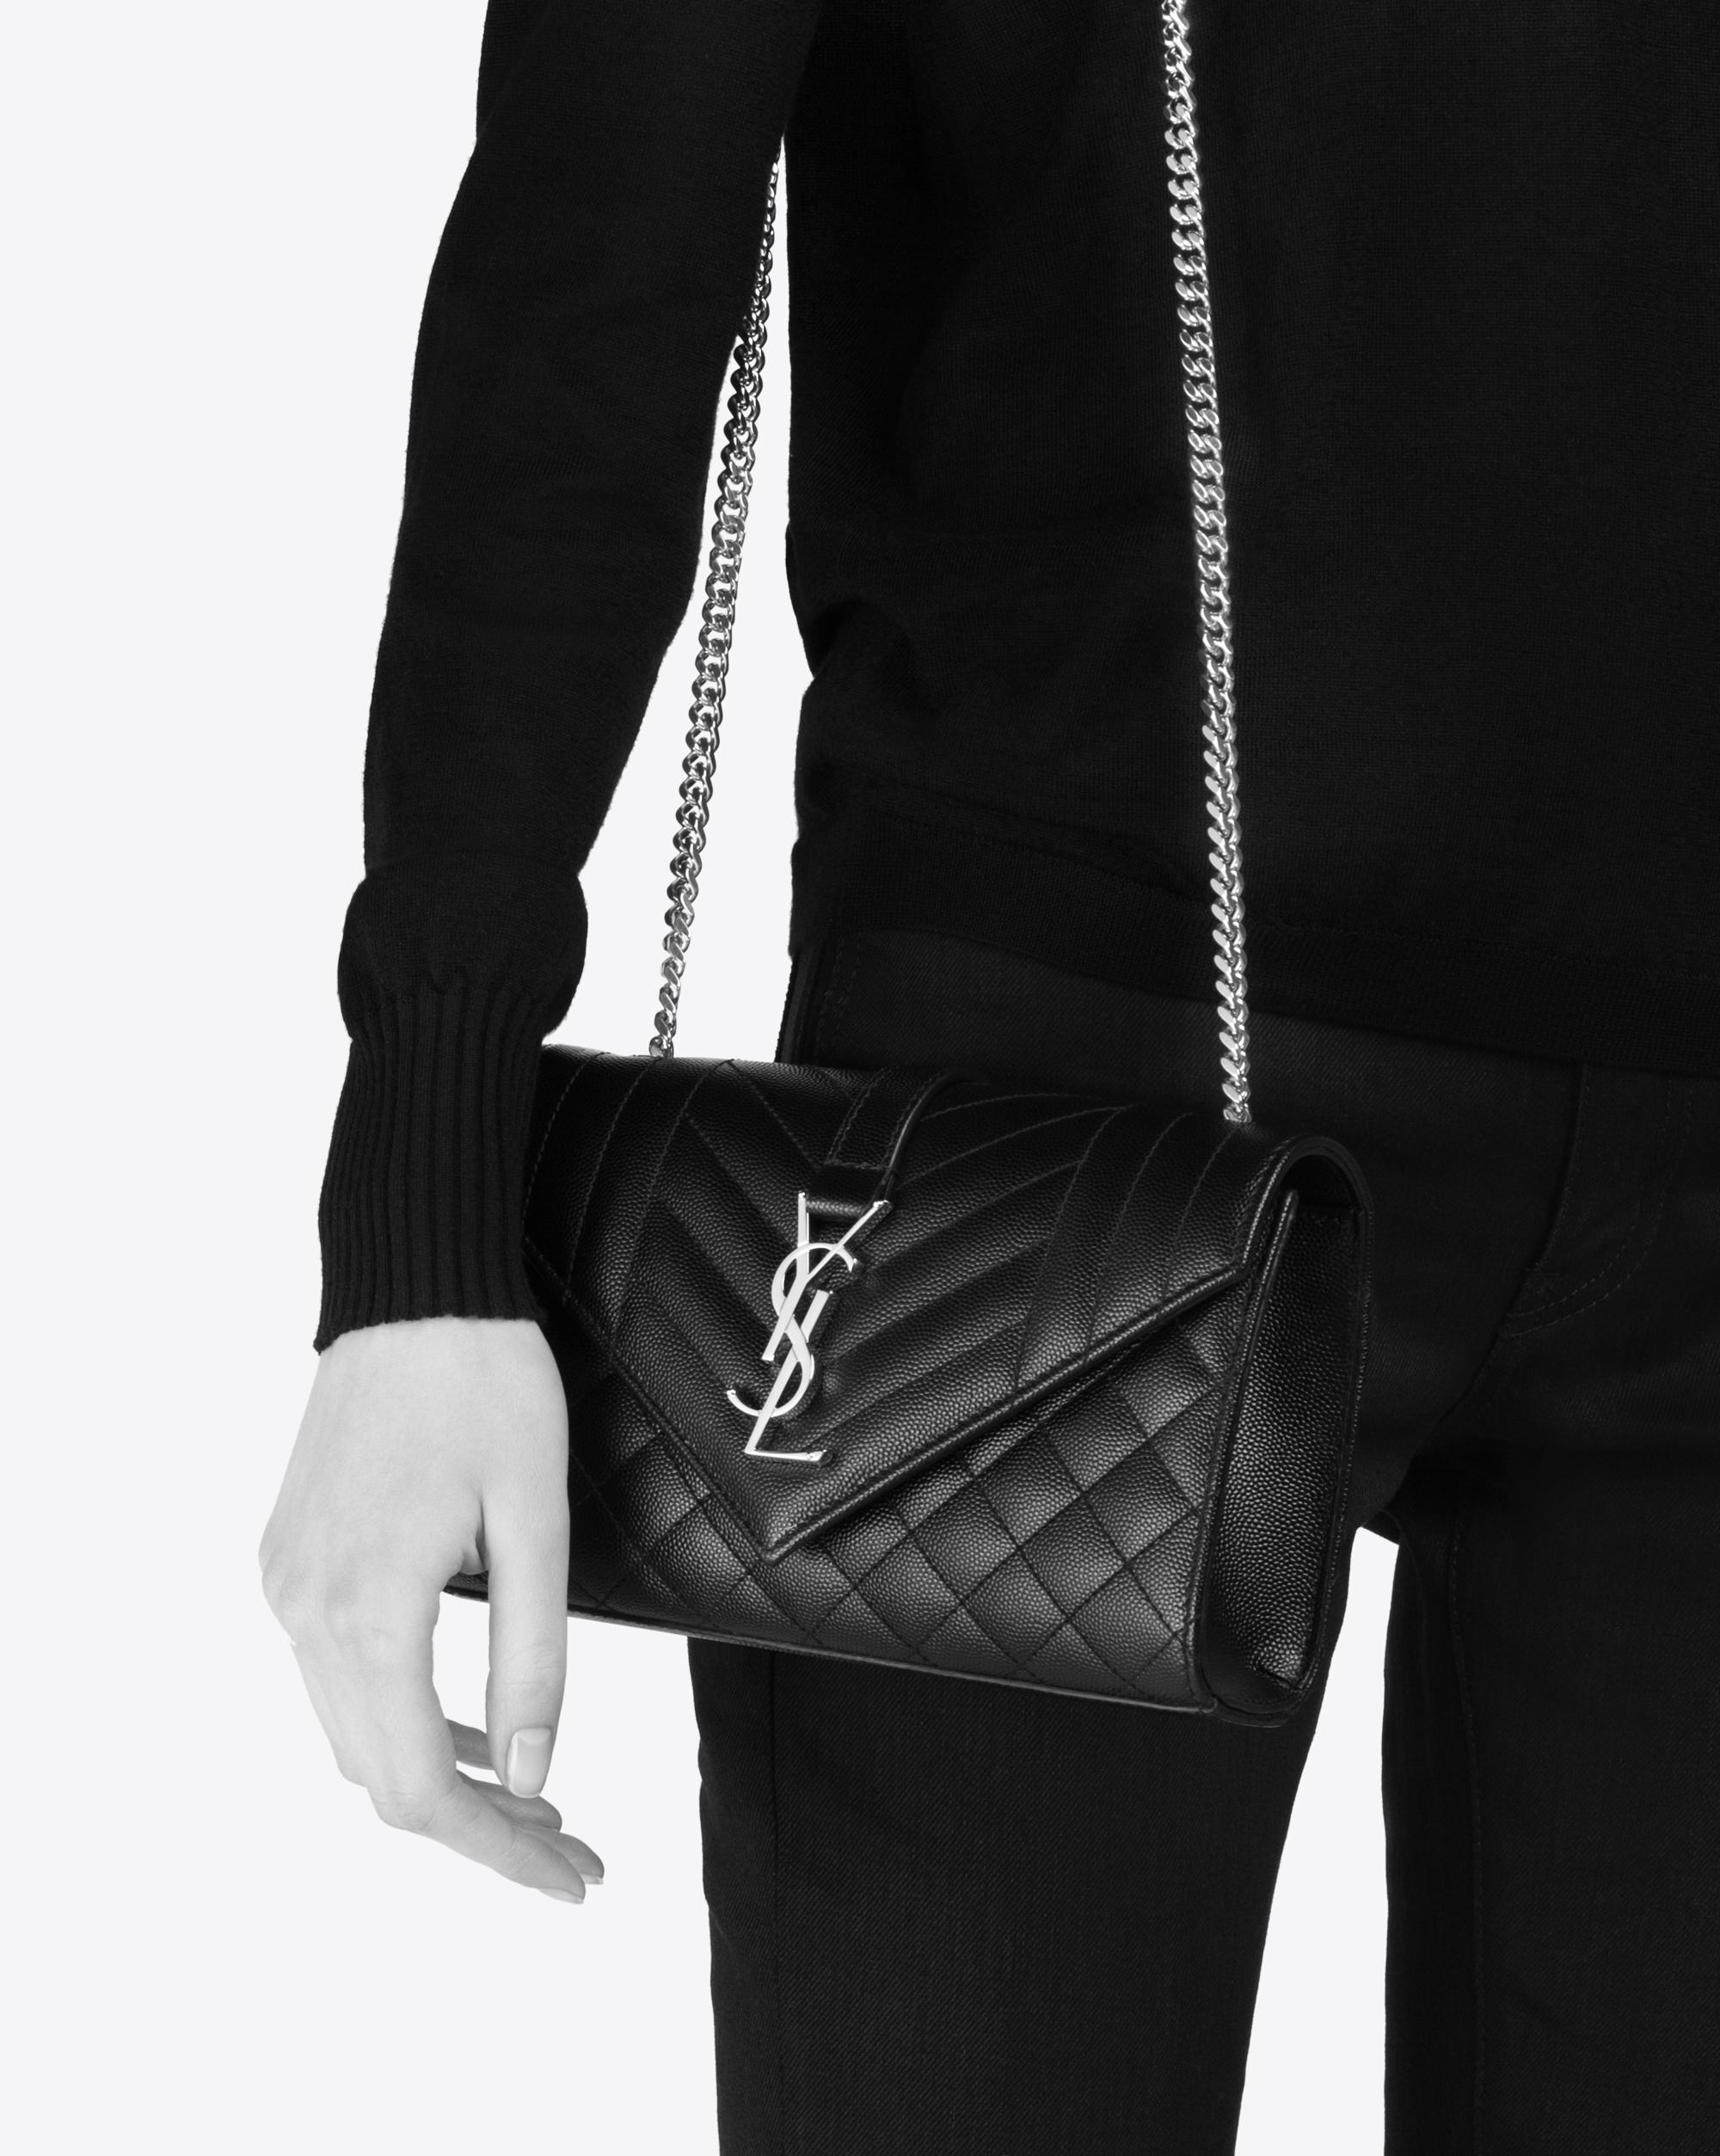 7a1807254f5a Saint Laurent - Black Envelope Small Bag In Grain De Poudre Embossed Leather  - Lyst. View fullscreen